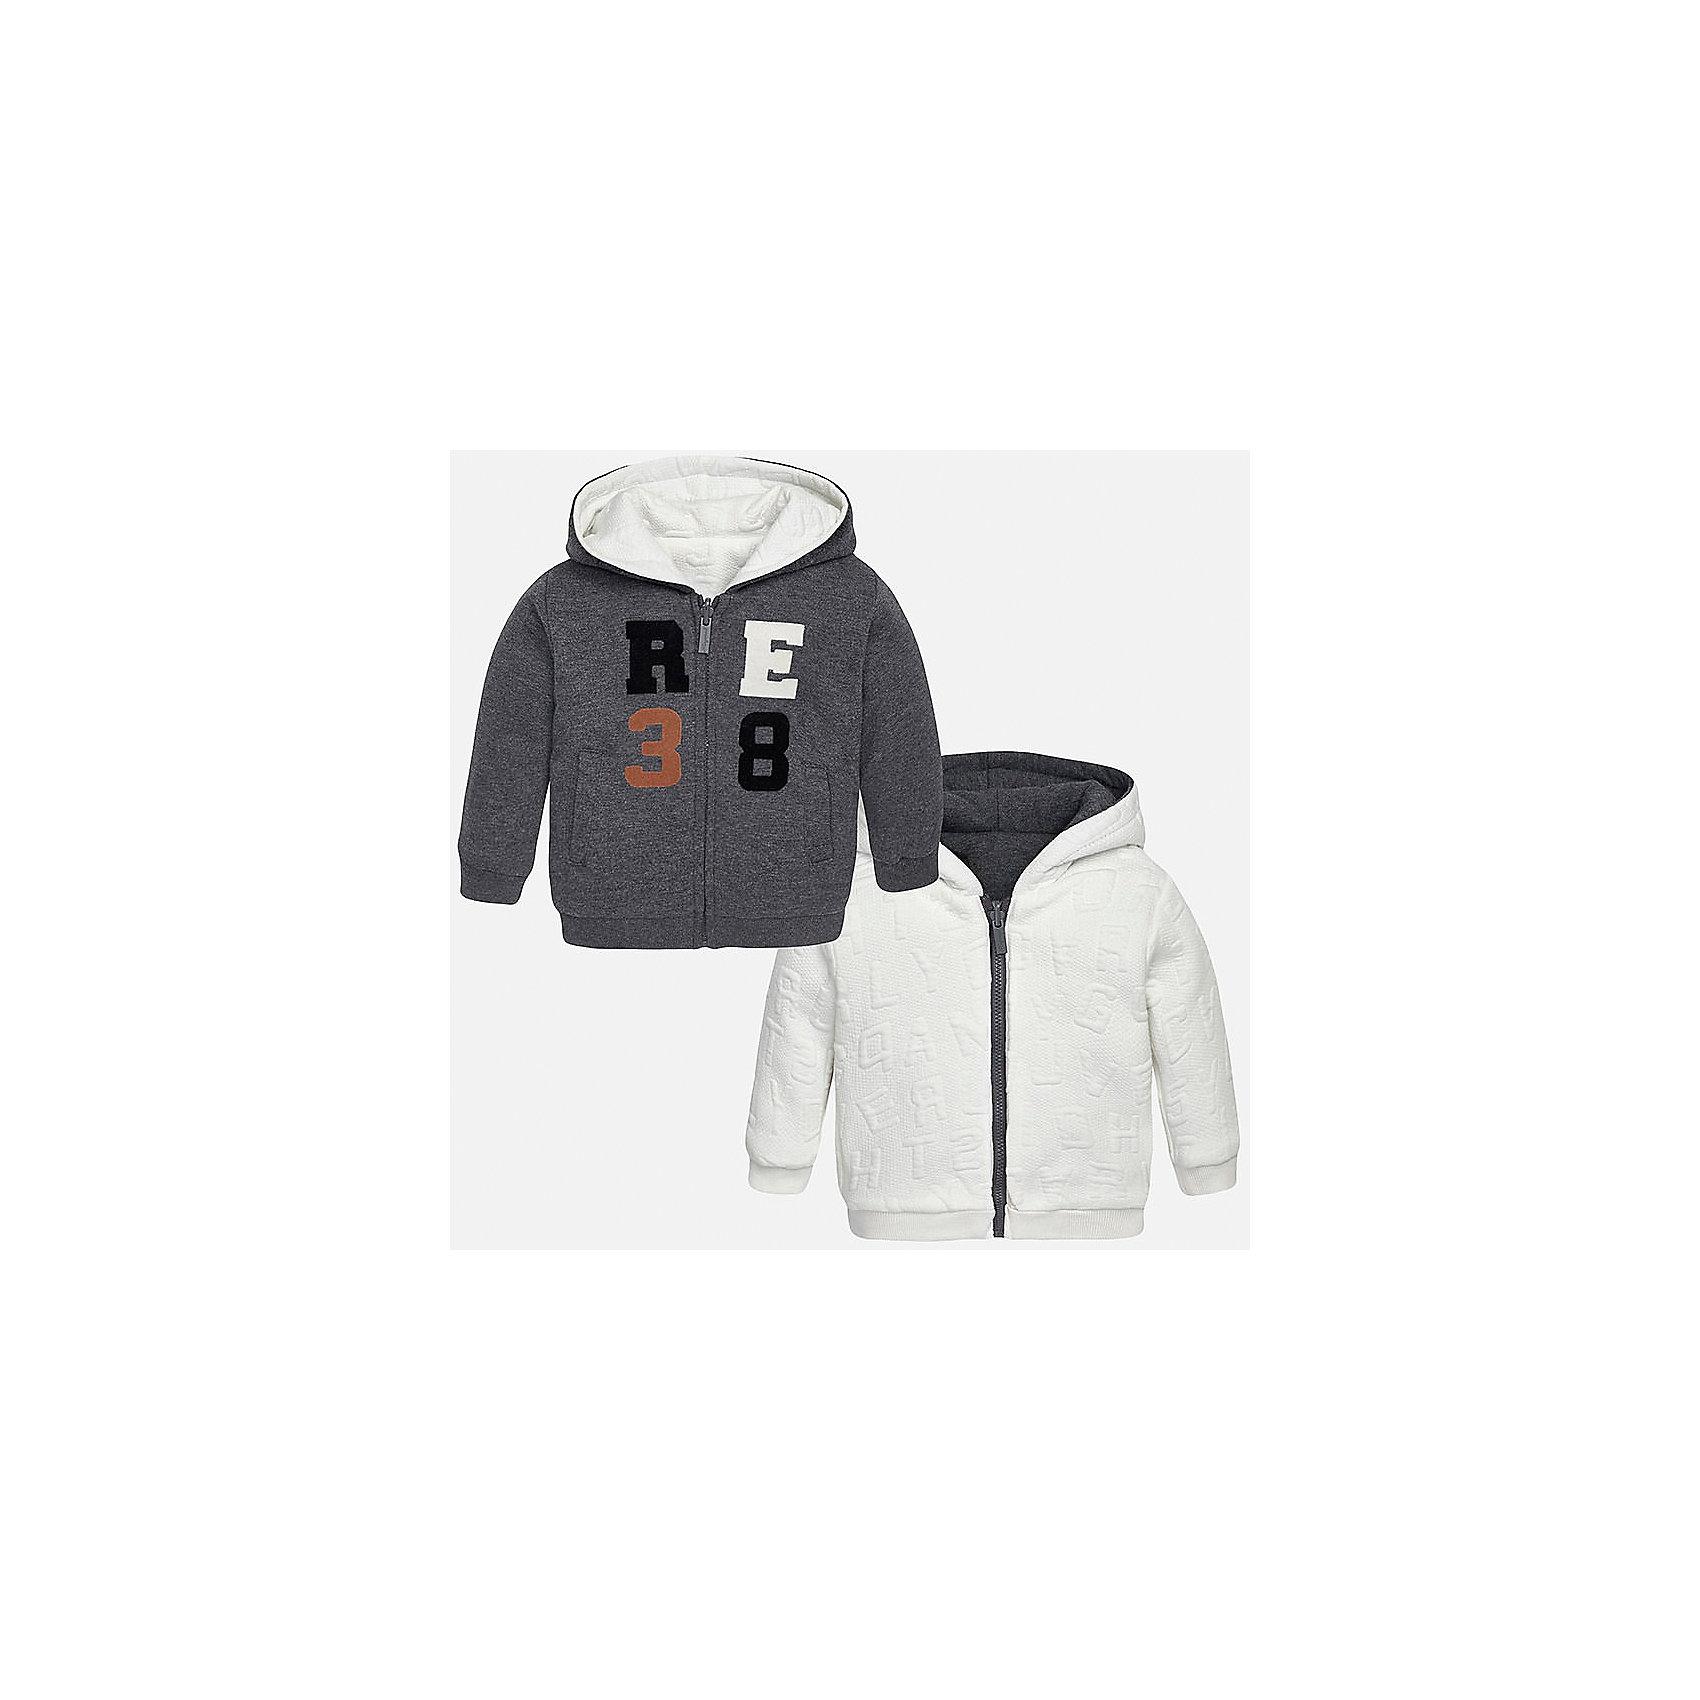 Mayoral Куртка для мальчика Mayoral trybeyond куртка для мальчика 999 77495 00 94z серый trybeyond page 7